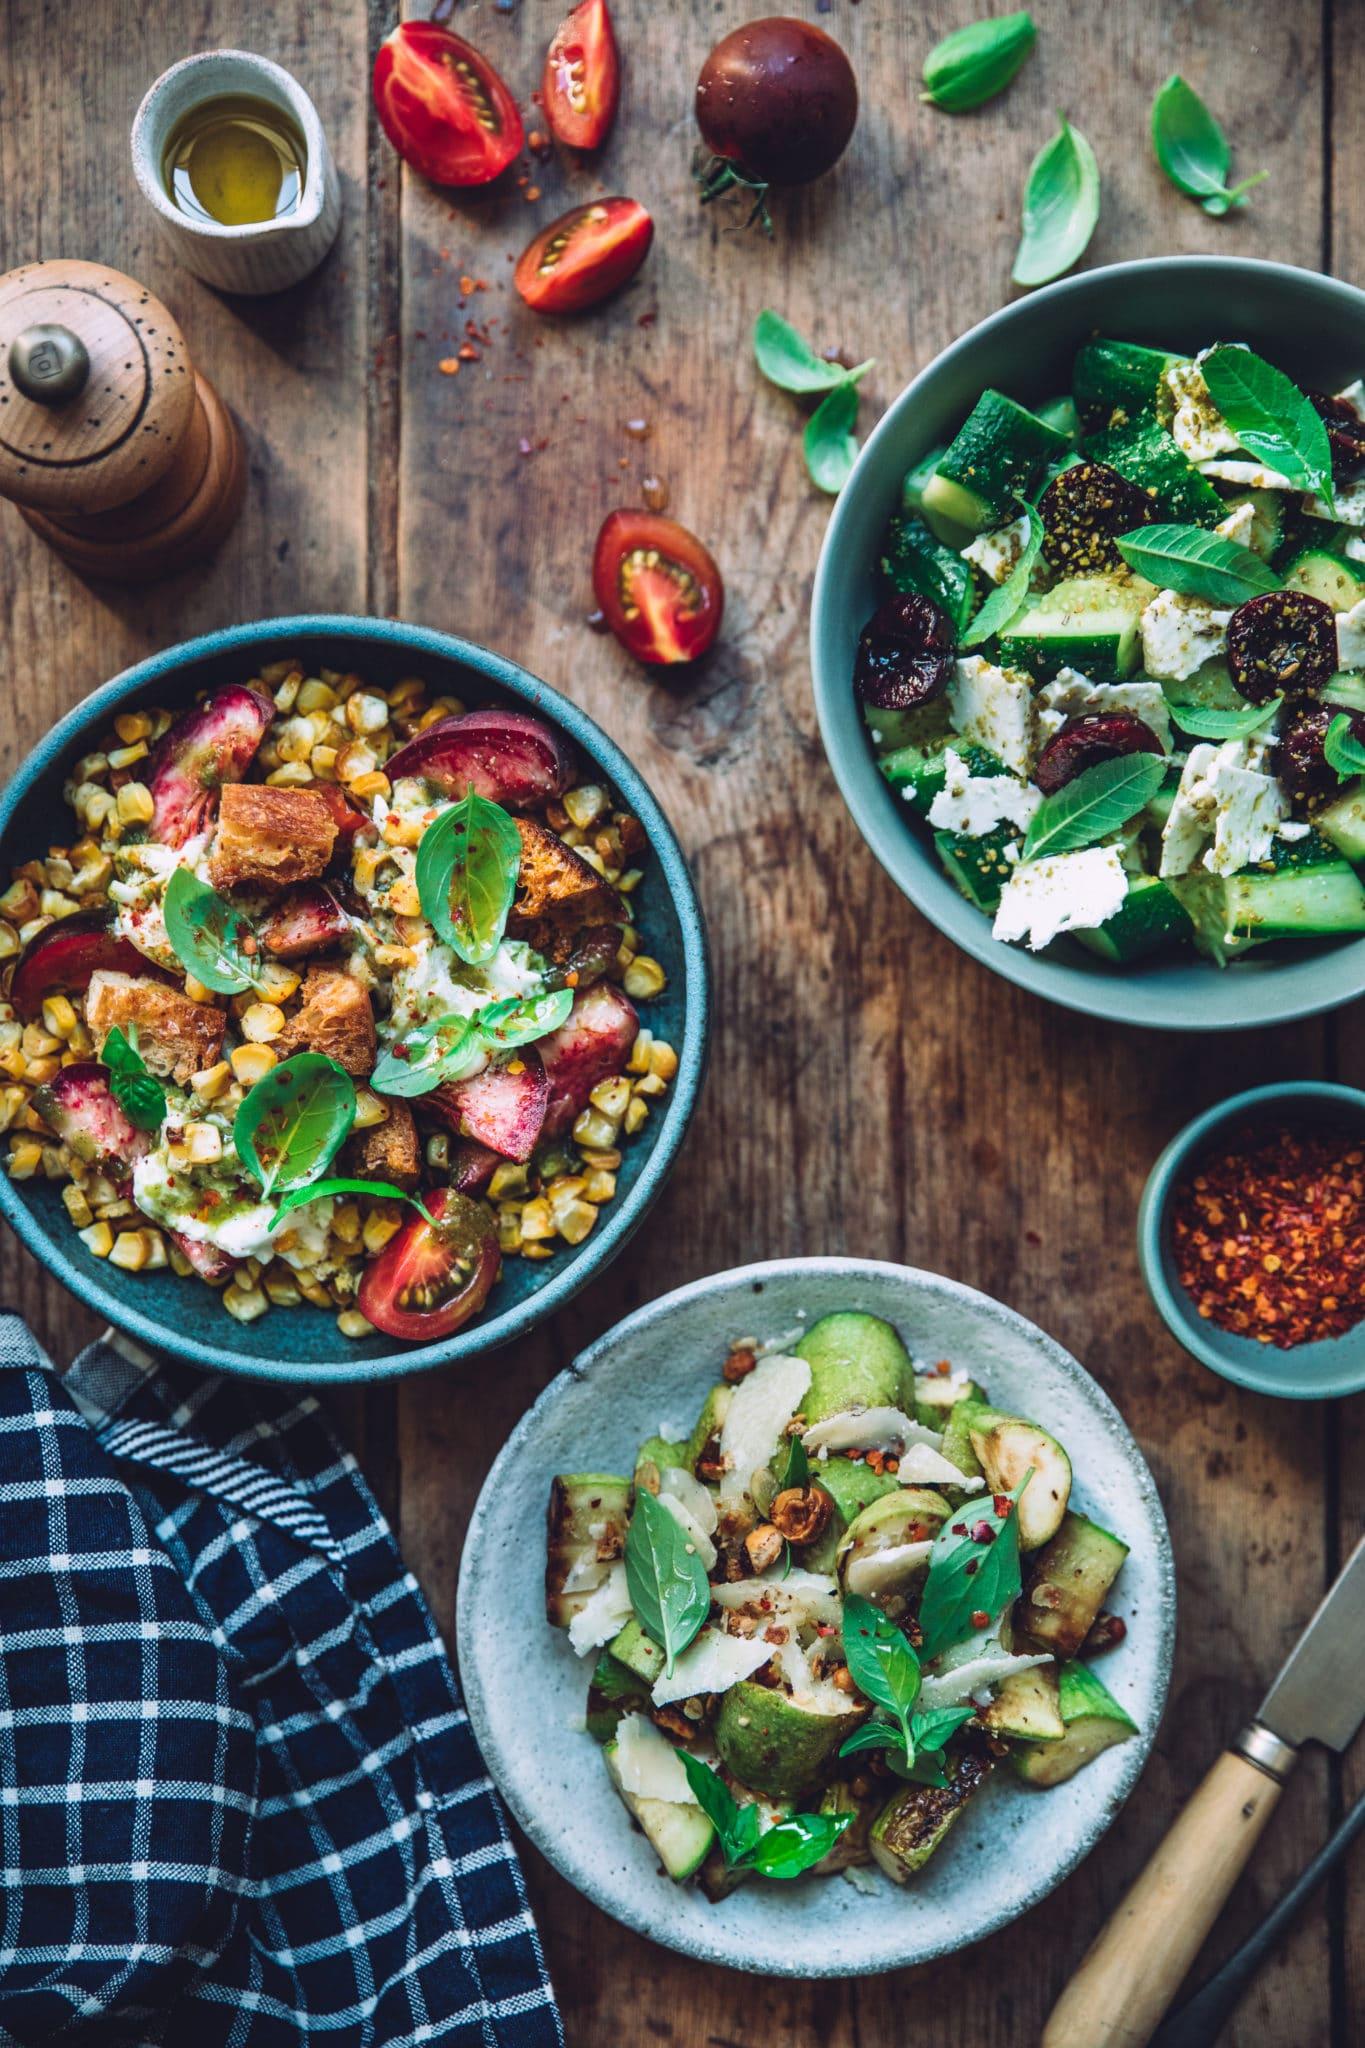 Salade styliste culinaire lyon - Mégane Arderighi megandcook